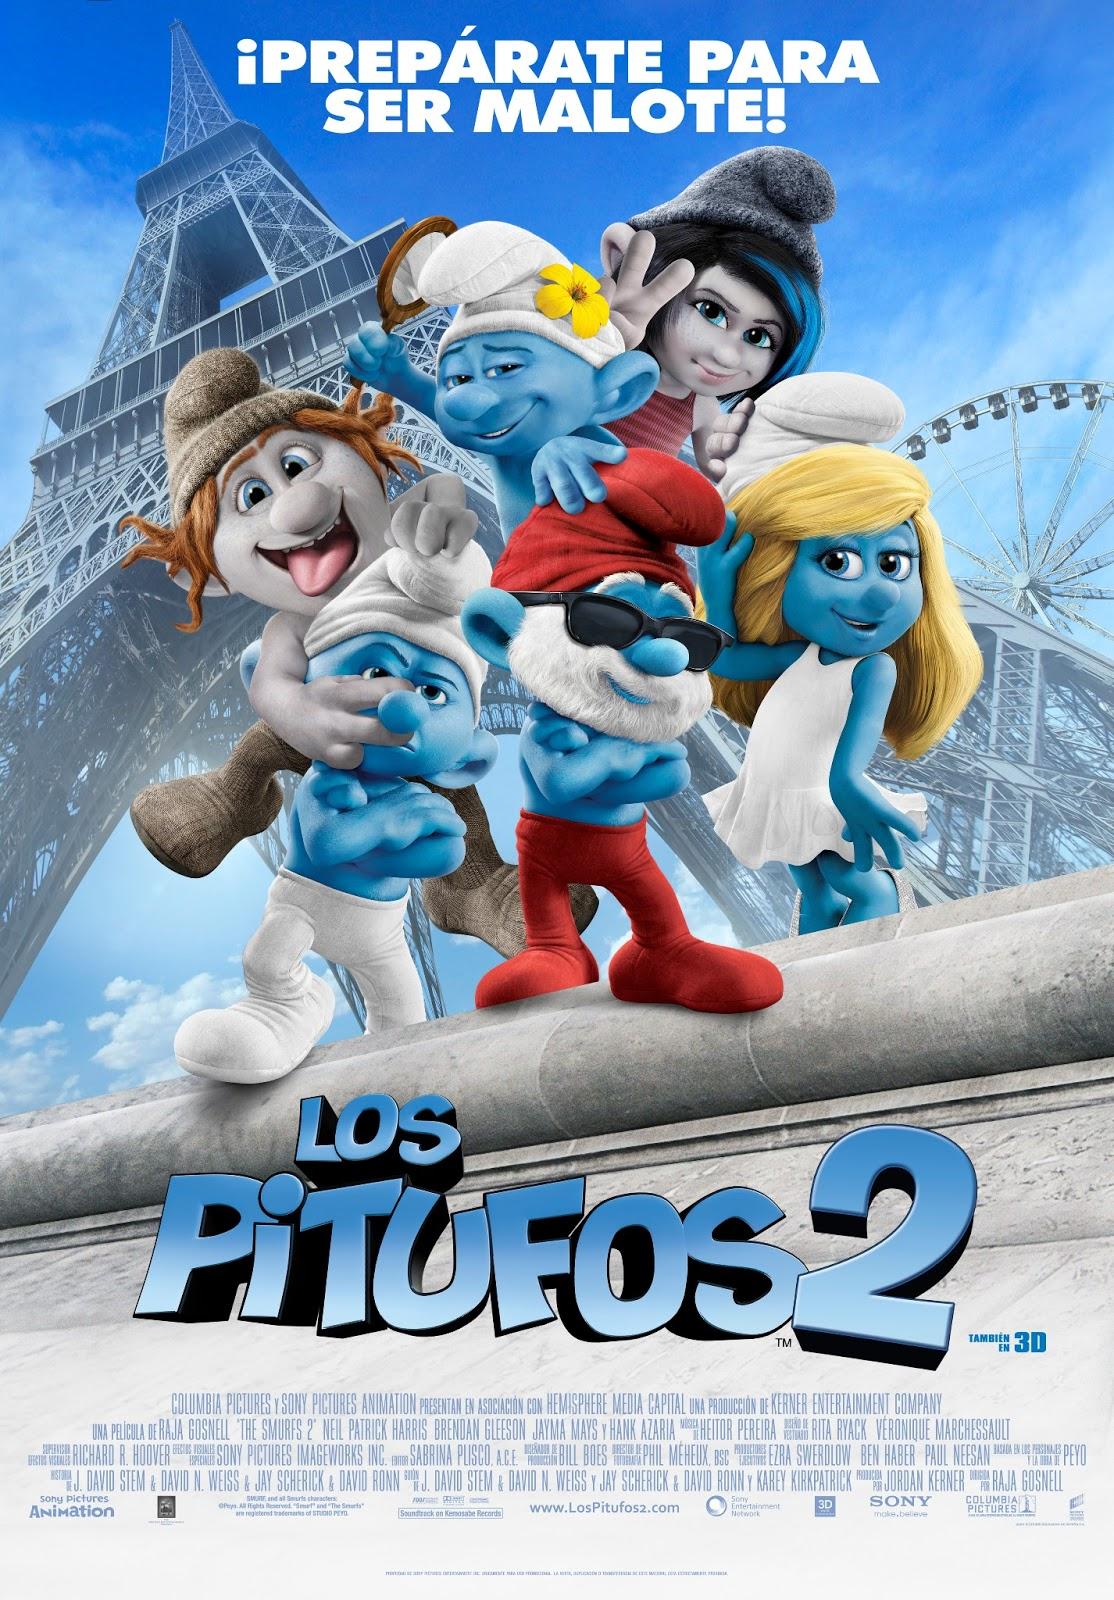 Los Pitufos 2 [2013] [DvdRip] [Latino]